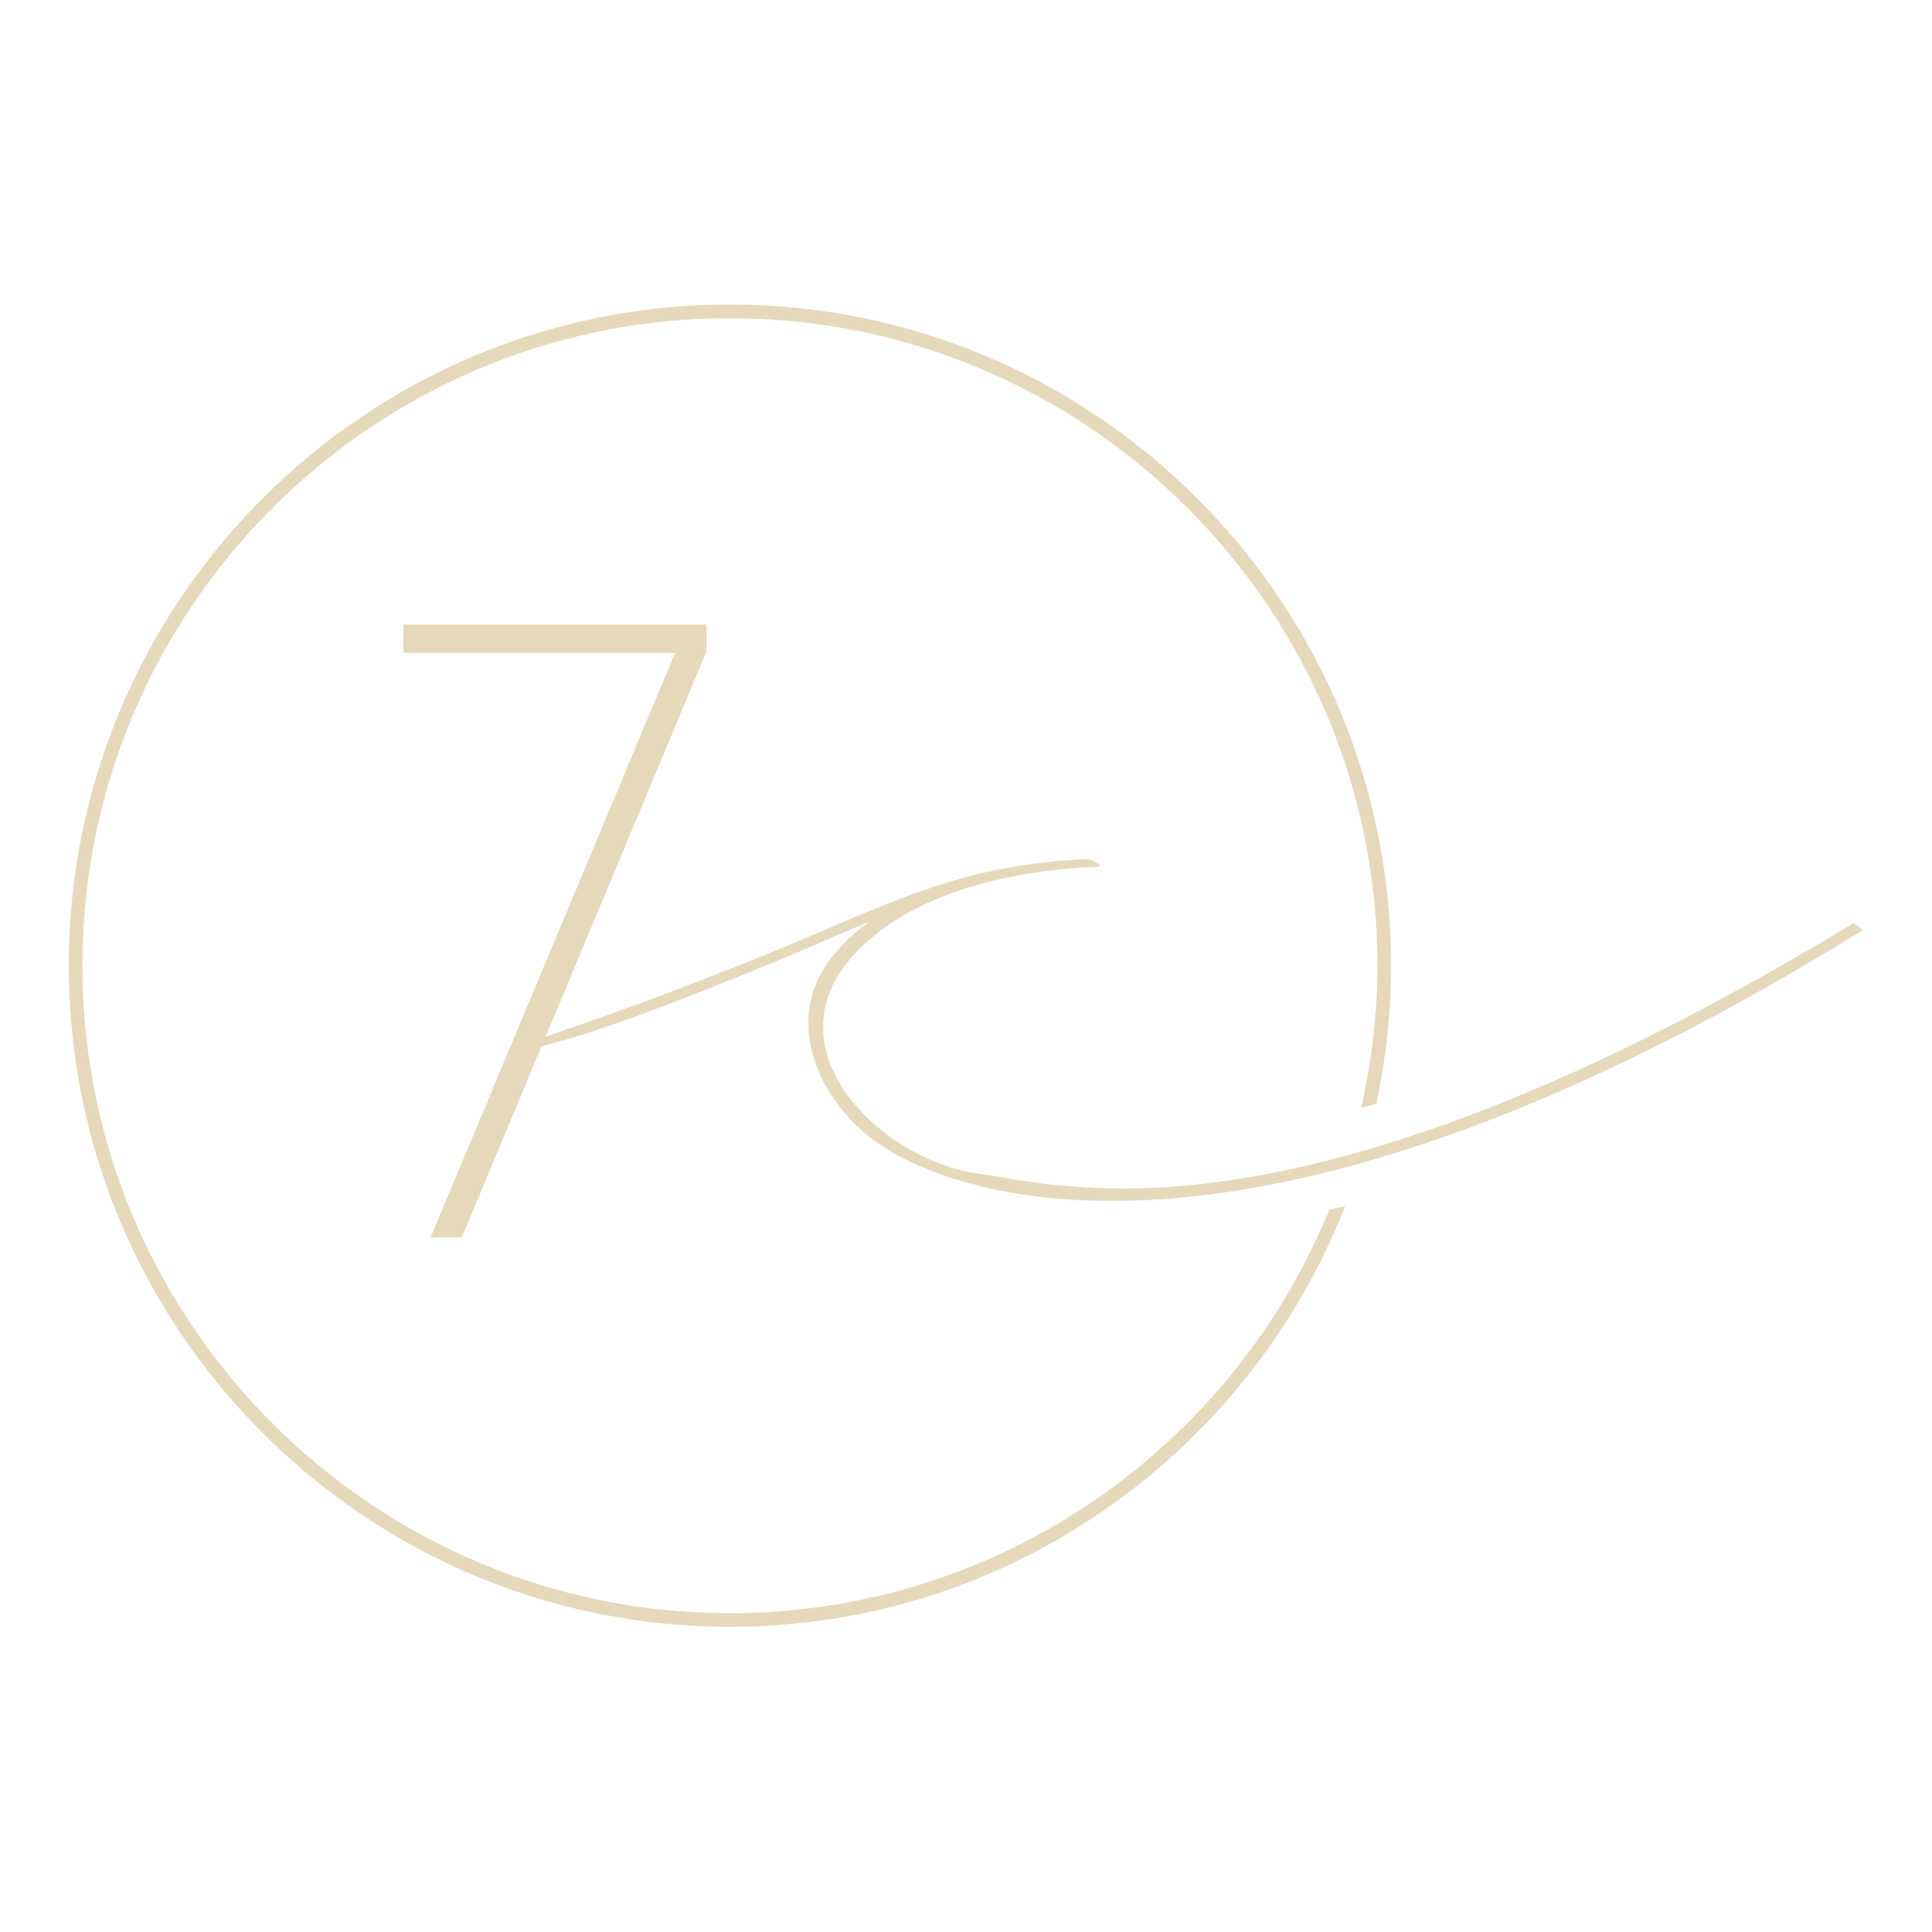 Design an updated logo for Texas' premier wedding blog, 7 Centerpieces